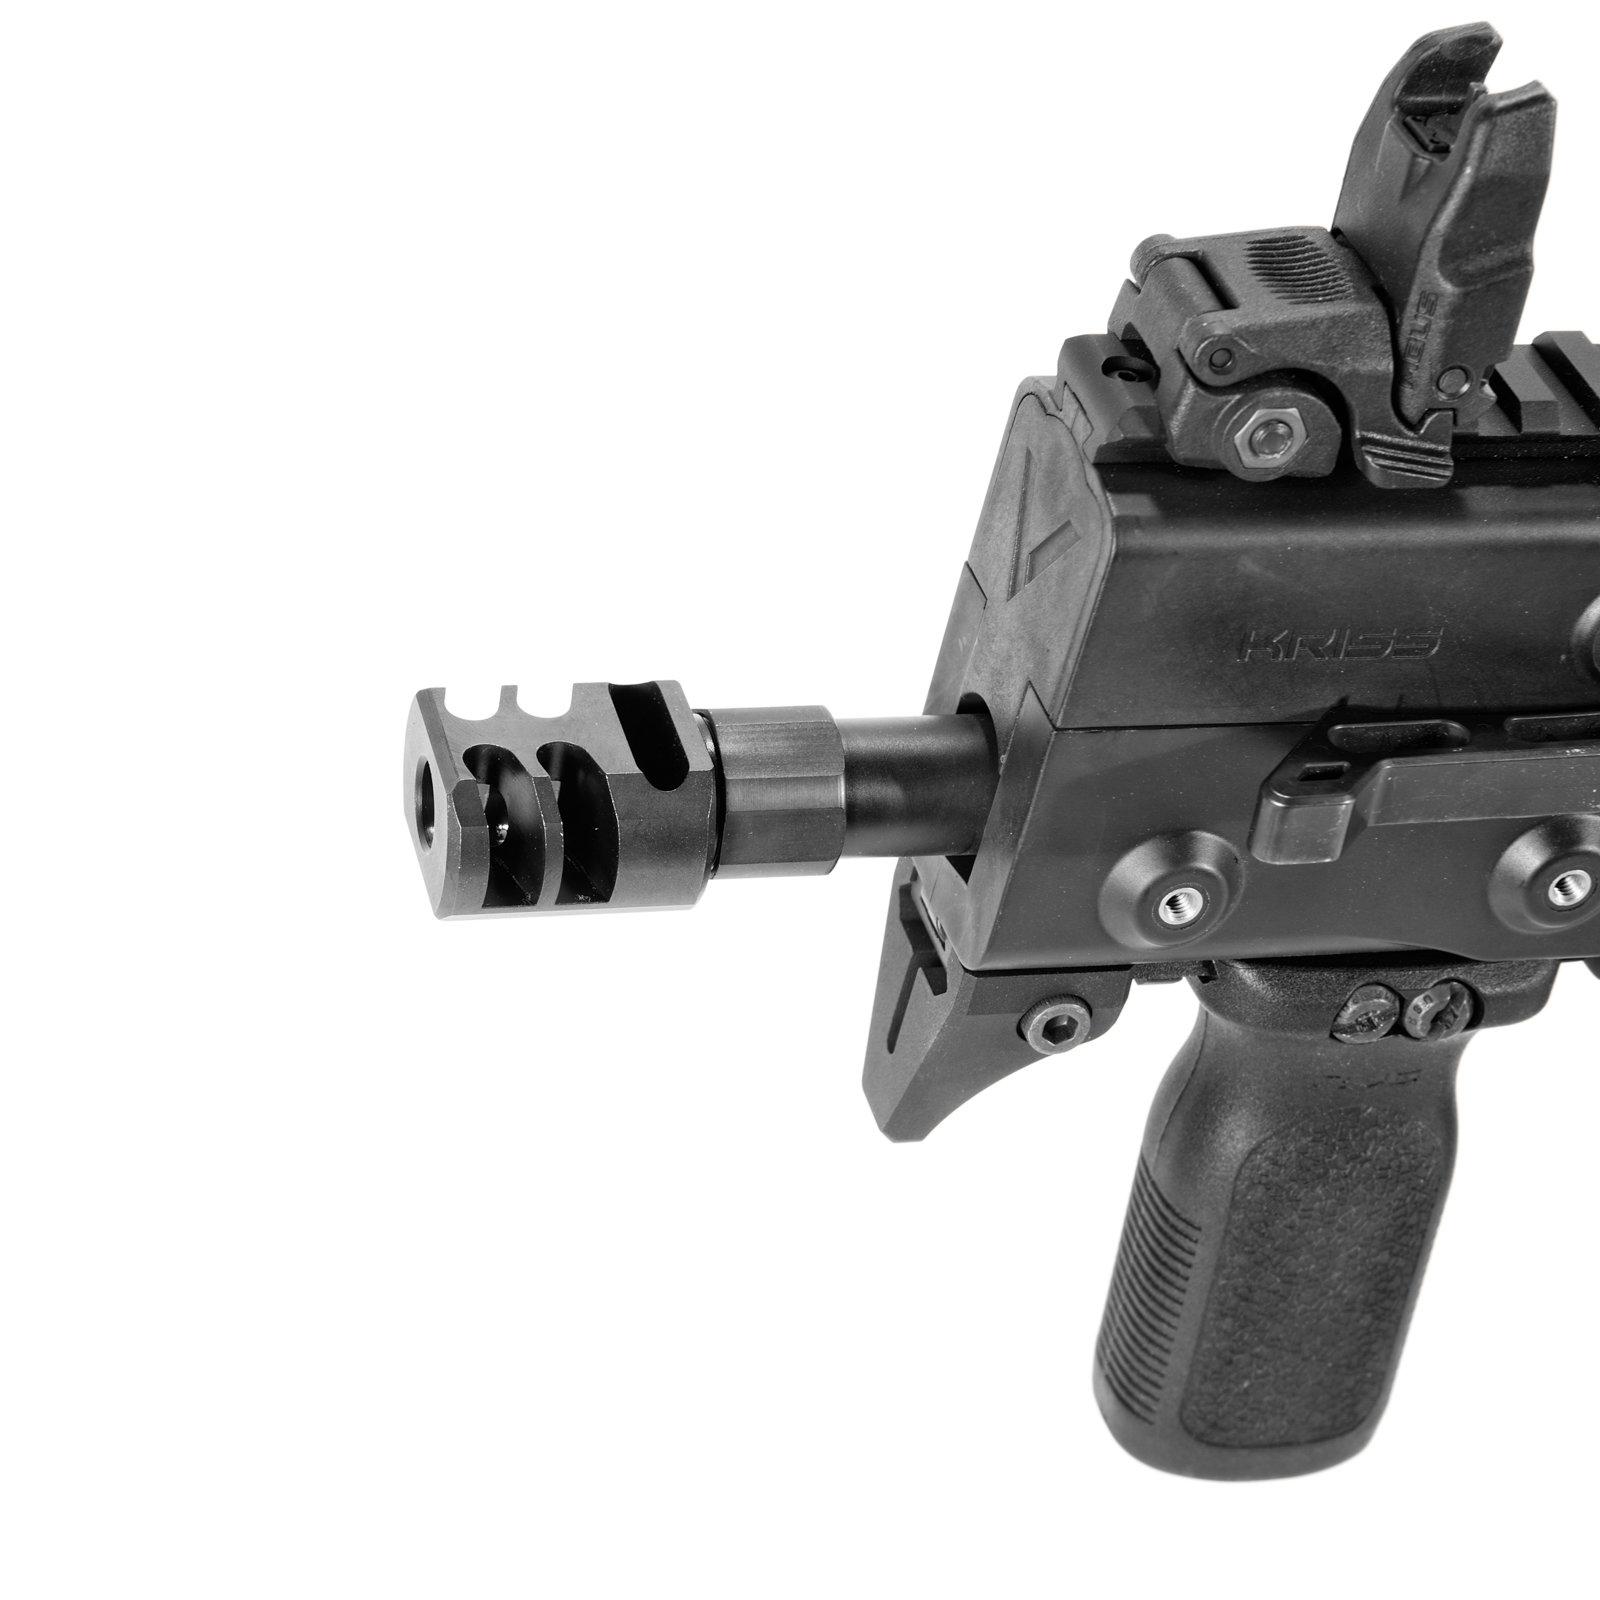 GunFighter Pistol PCC Carbine SMG Muzzle Brake